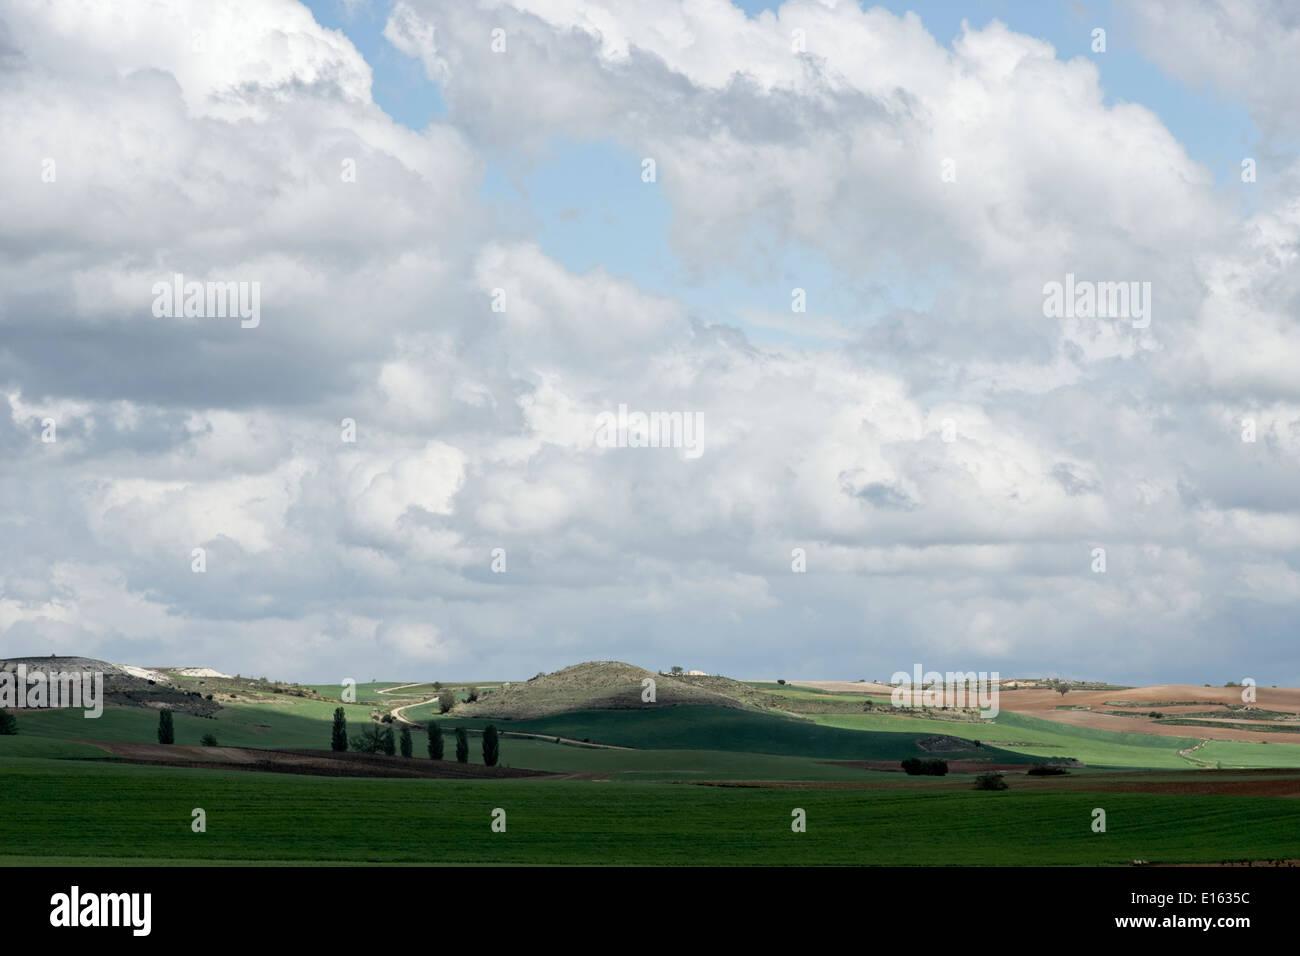 Ribera del Duero countryside, Spain. - Stock Image